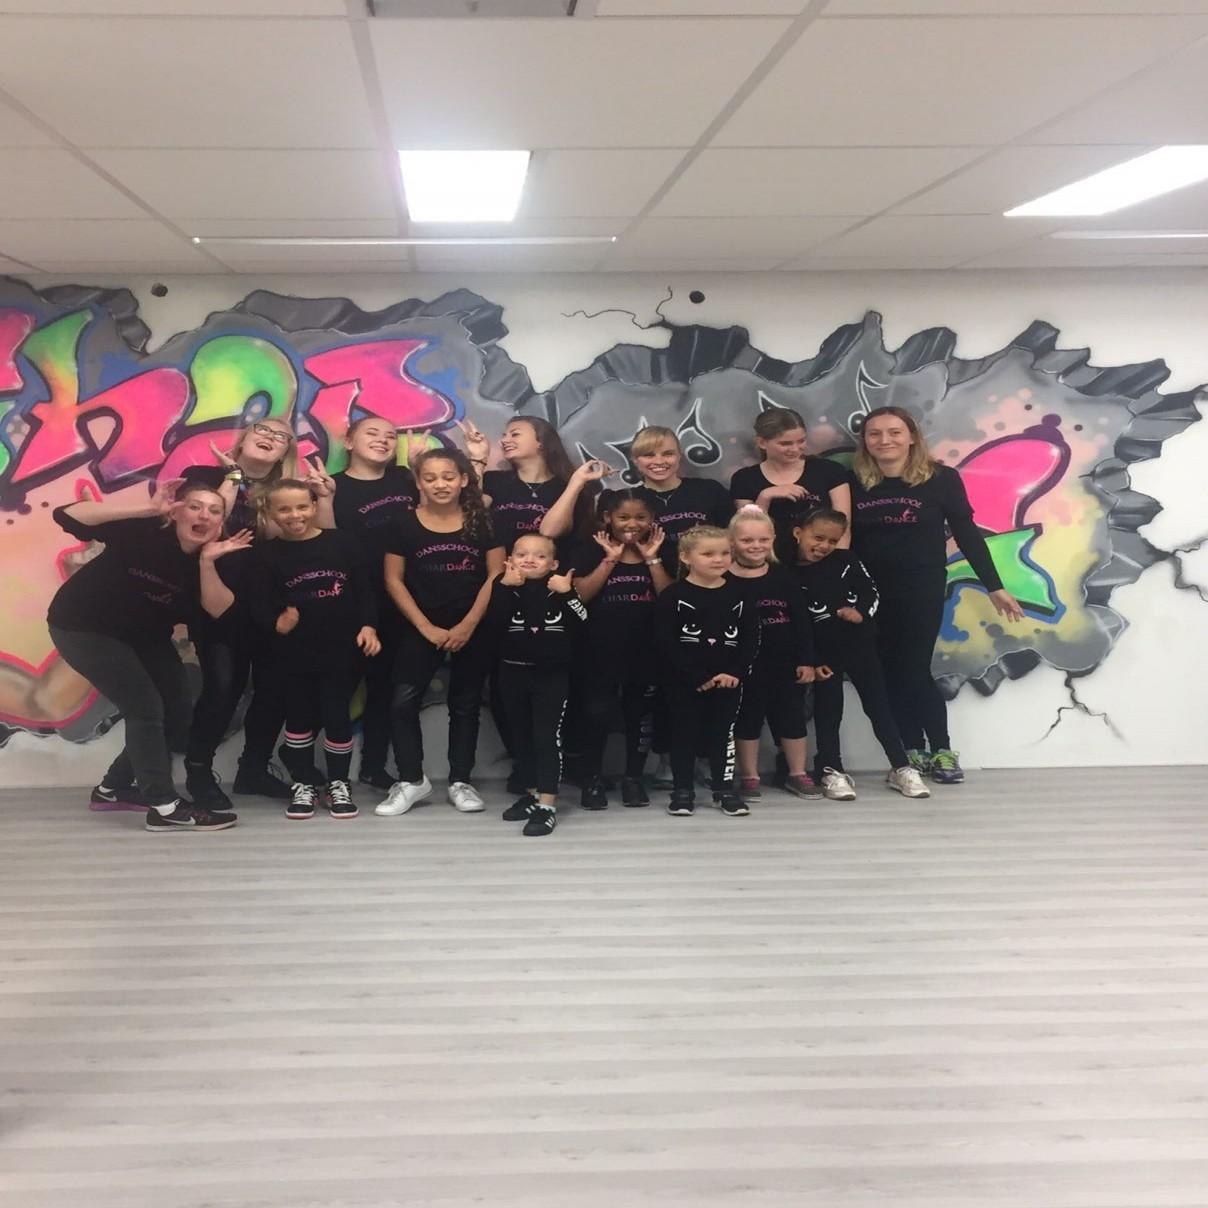 Chardance dansschool